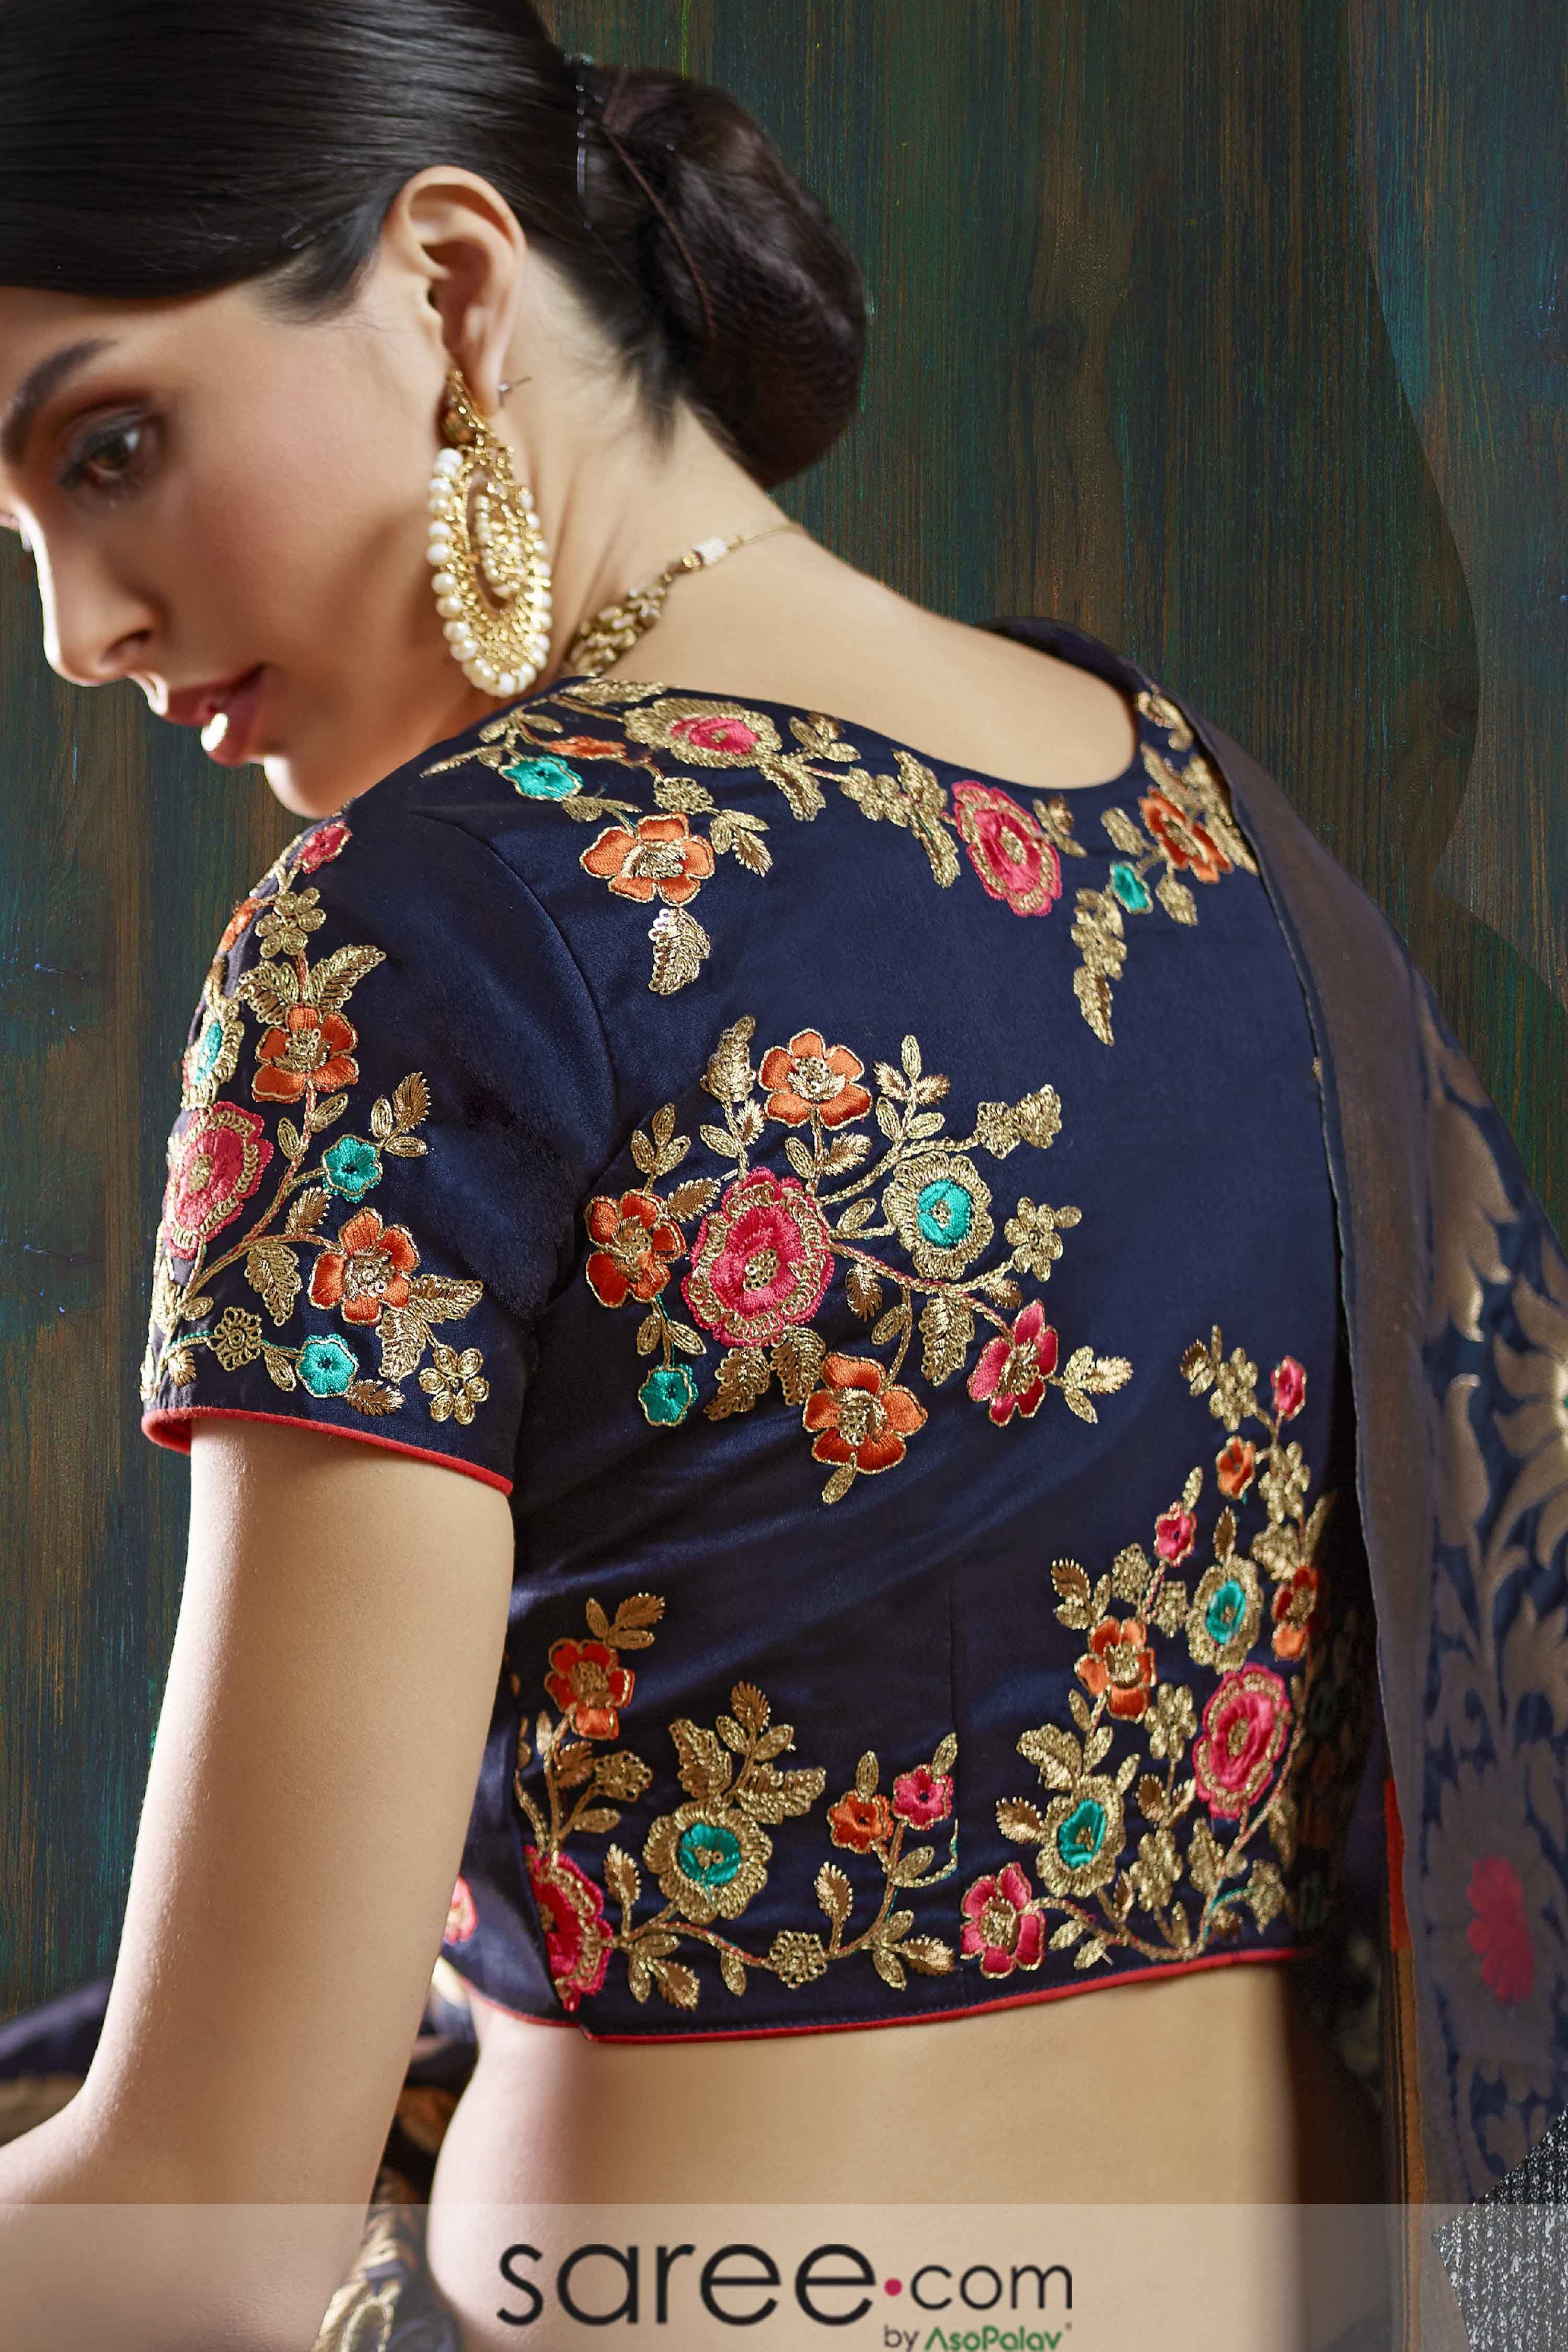 979377eb8449b9 Royal blue round neck blouse